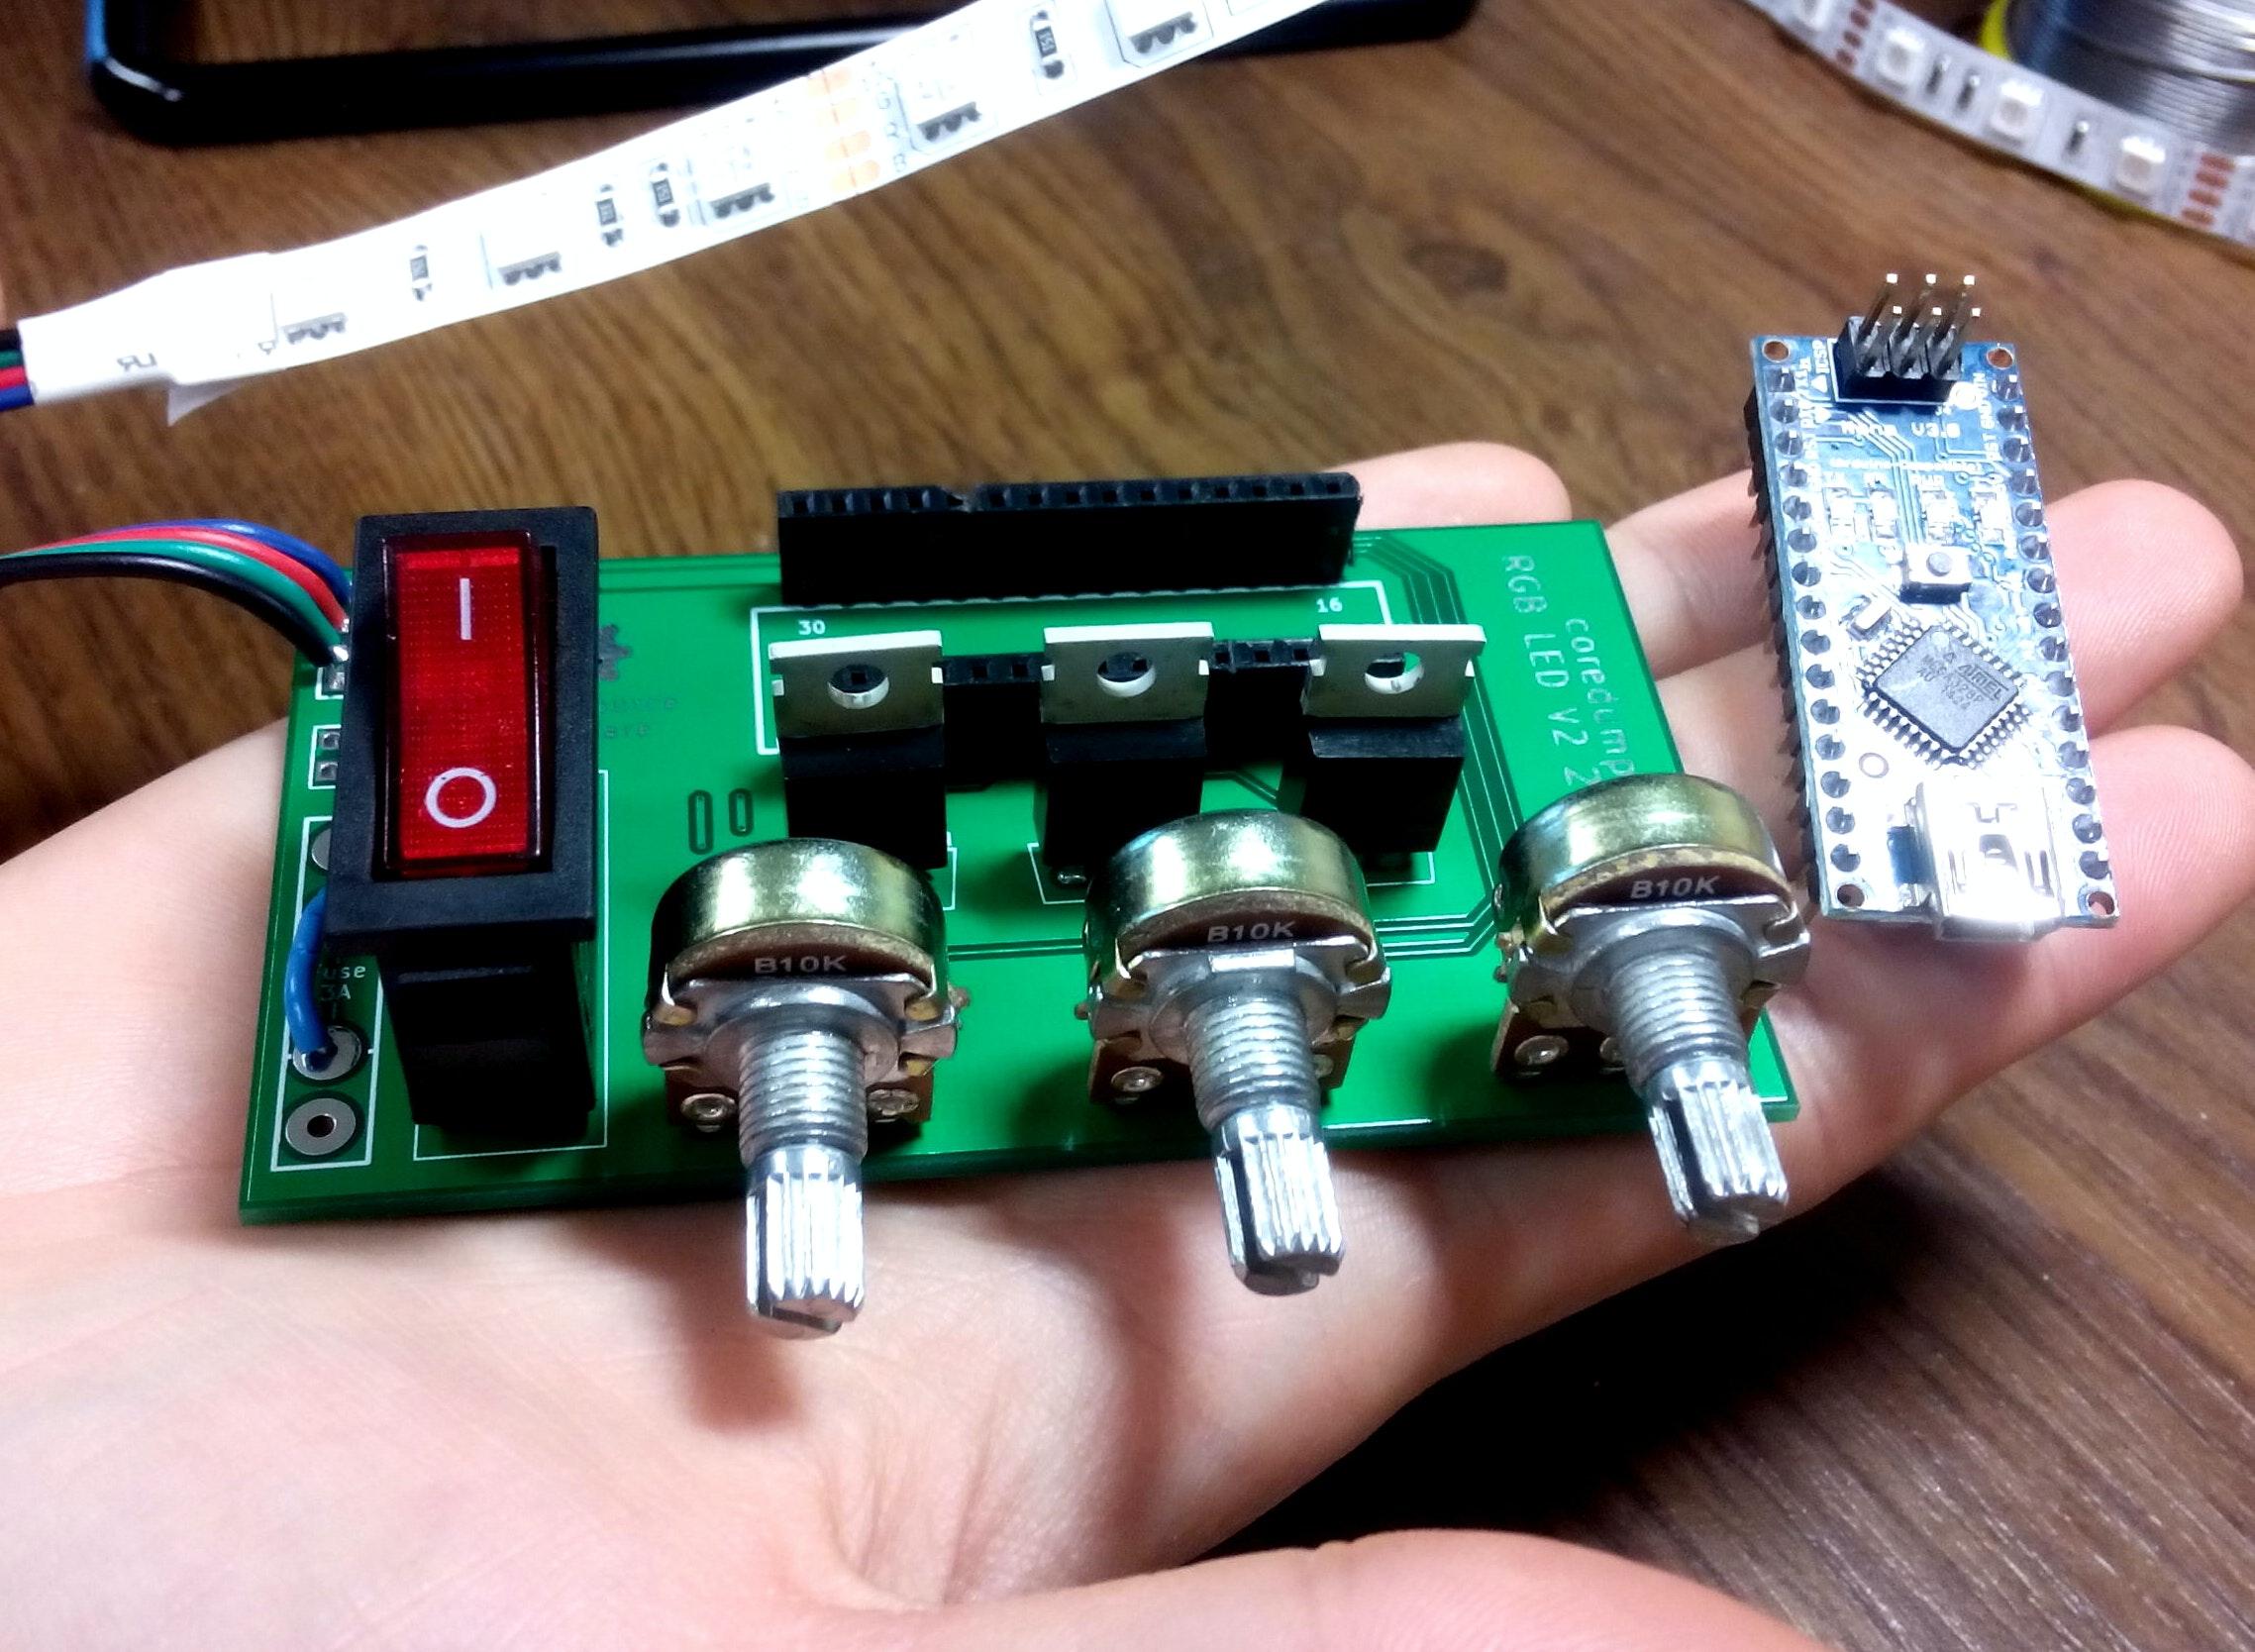 2014 12 20_14.36.21?auto=compress%2Cformat&w=900&h=675&fit=min arduino controlled rgb led strip hackster io Esp8266 RGB Strip at edmiracle.co